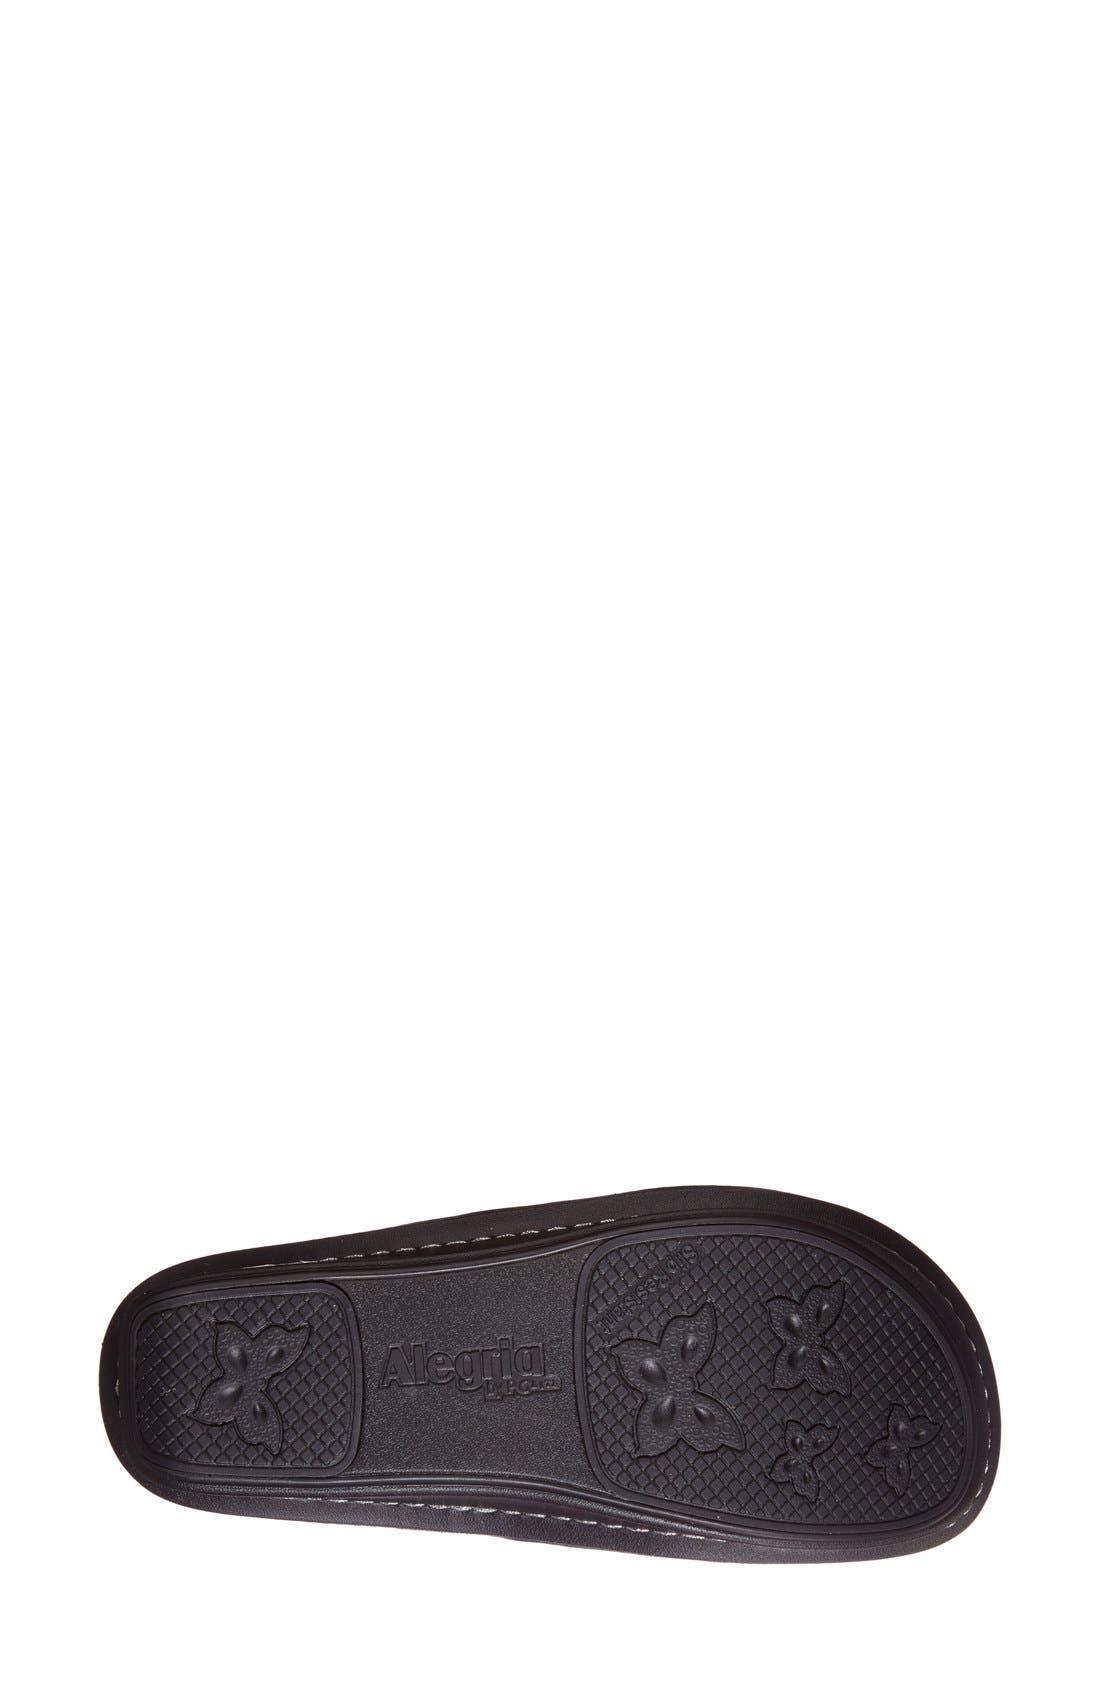 'Colette' Platform Sandal,                             Alternate thumbnail 24, color,